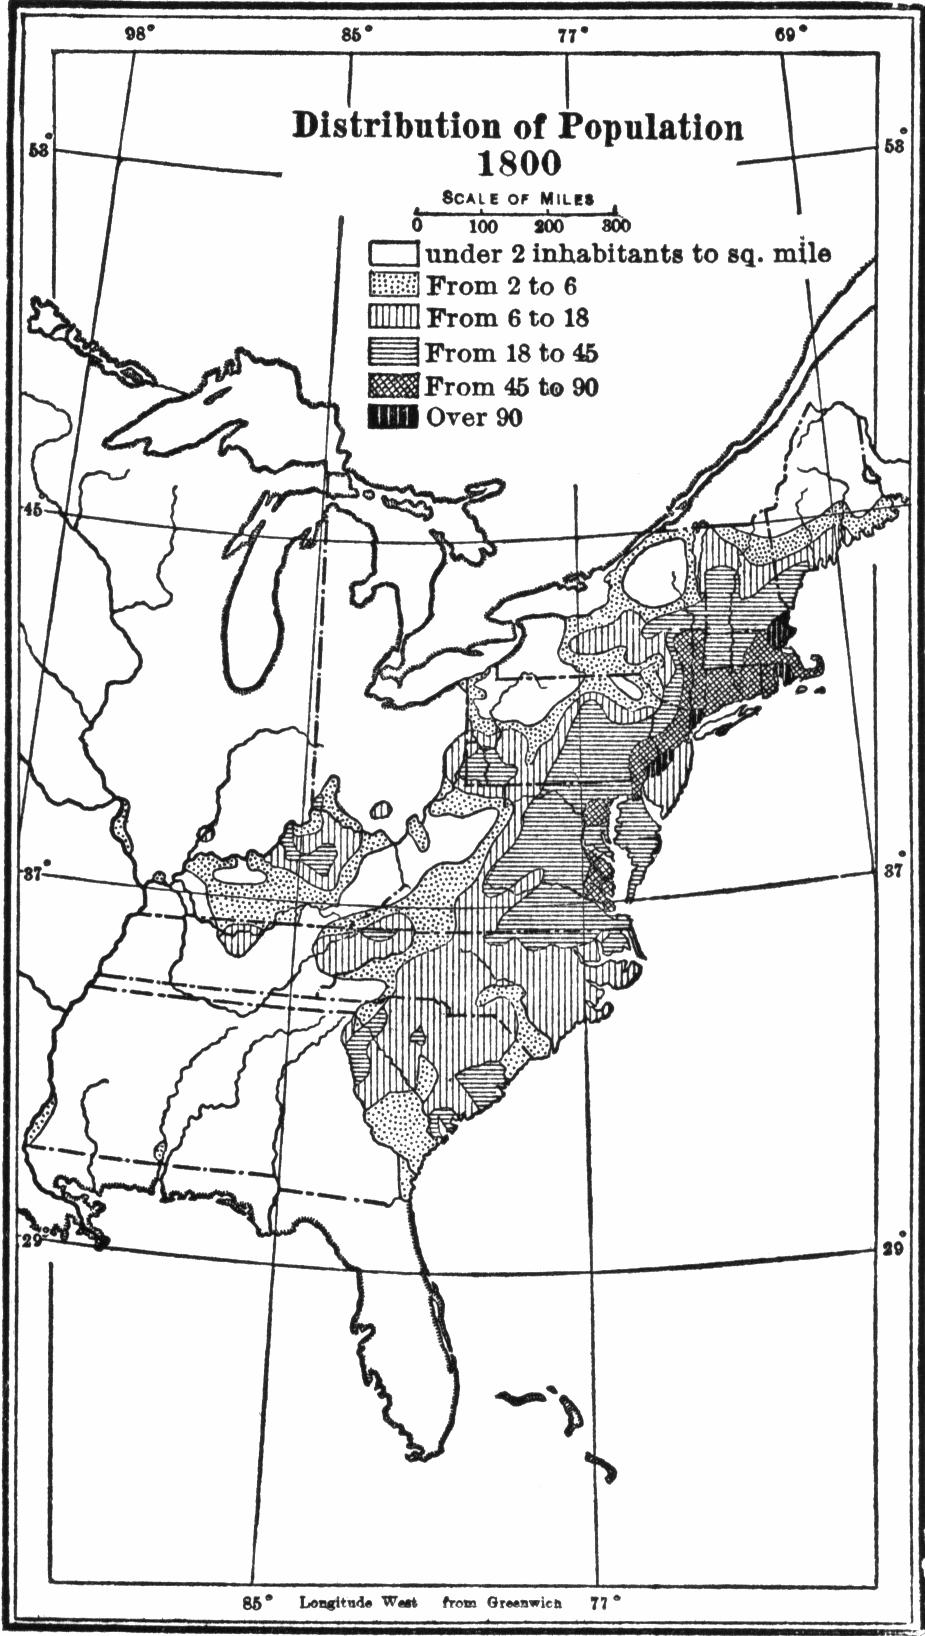 USA population distribution 1800